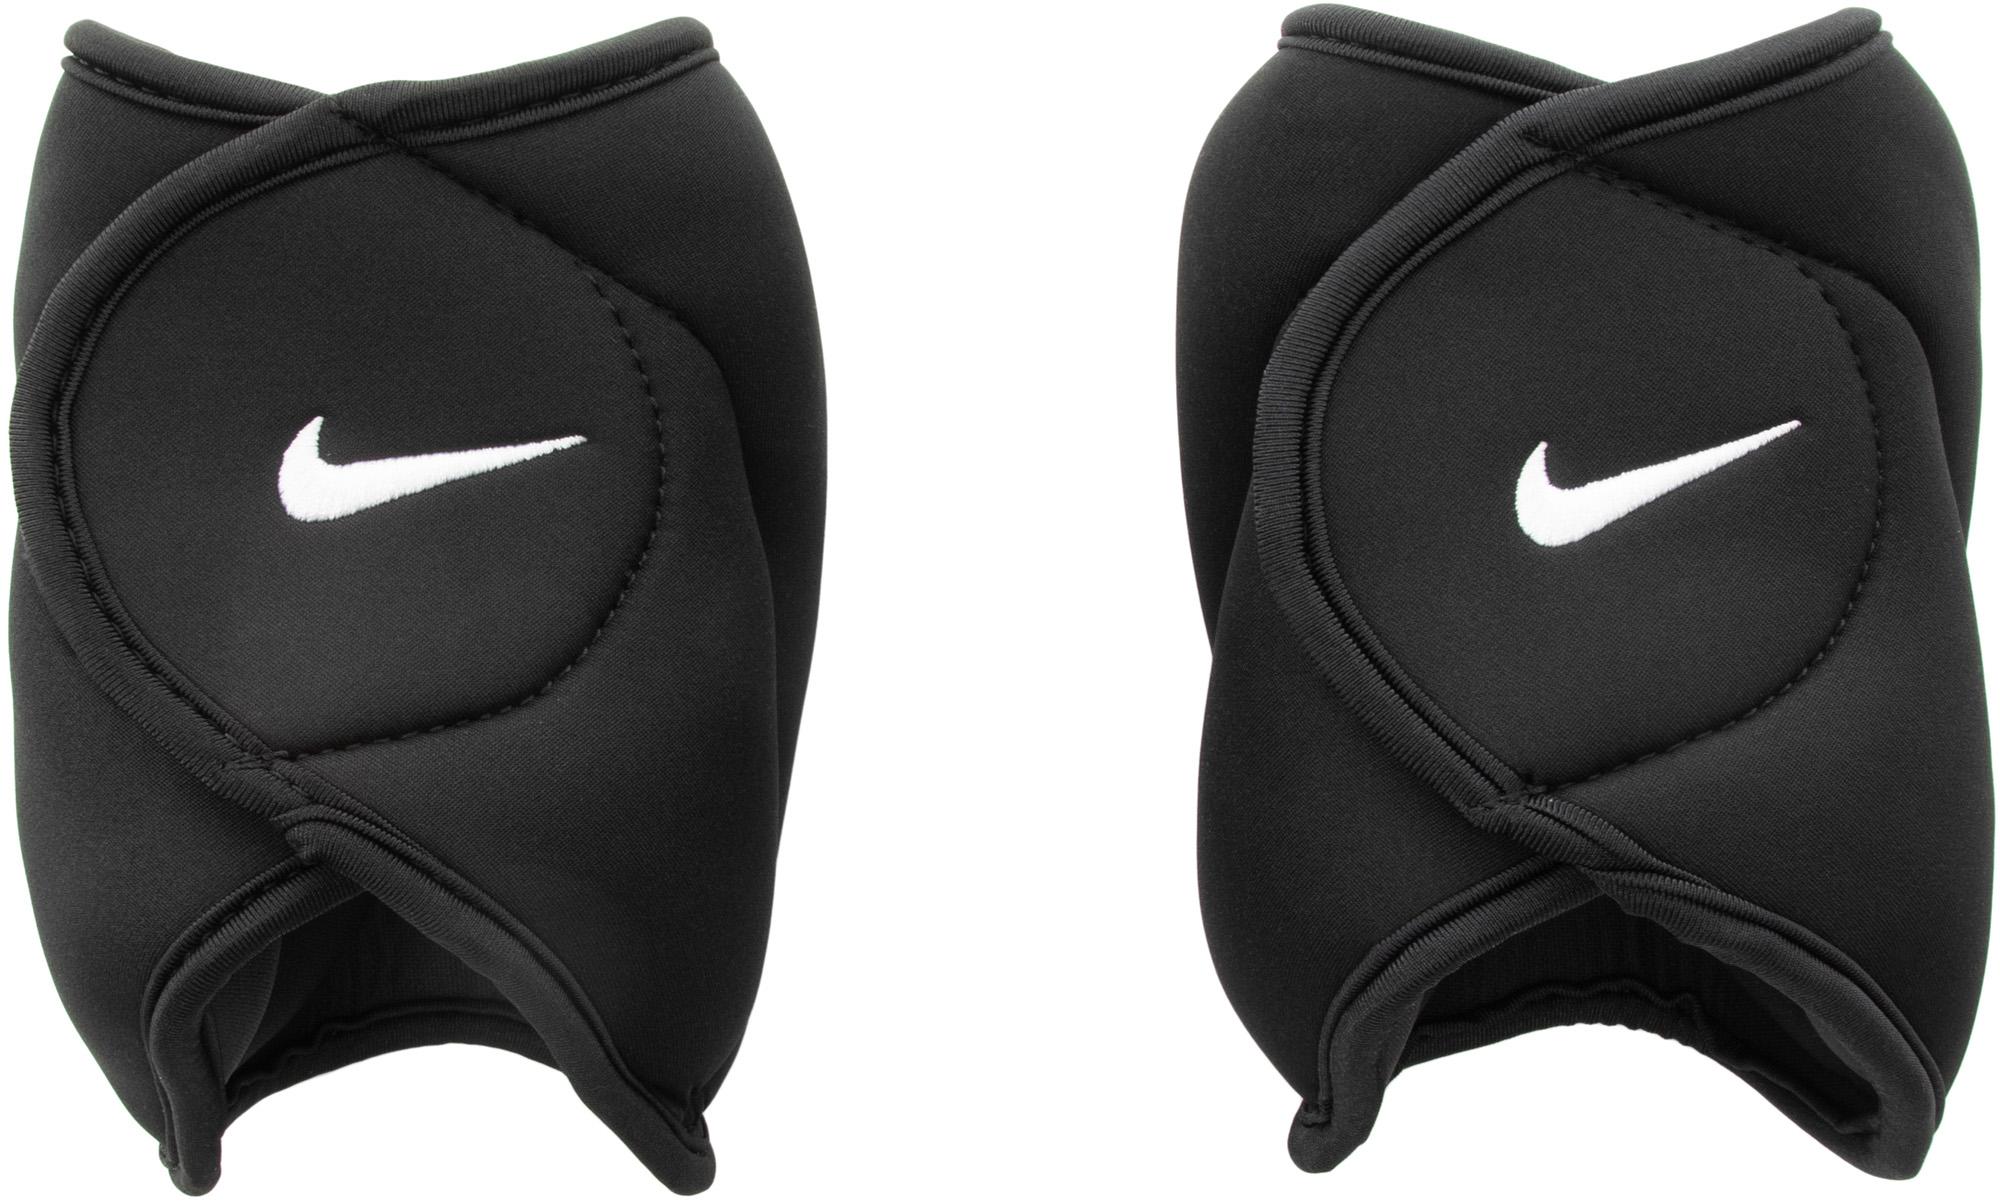 Nike Accessories Утяжелители Nike Accessories, 2 х 2.27 кг nike accessories эспандер универсальный nike accessories